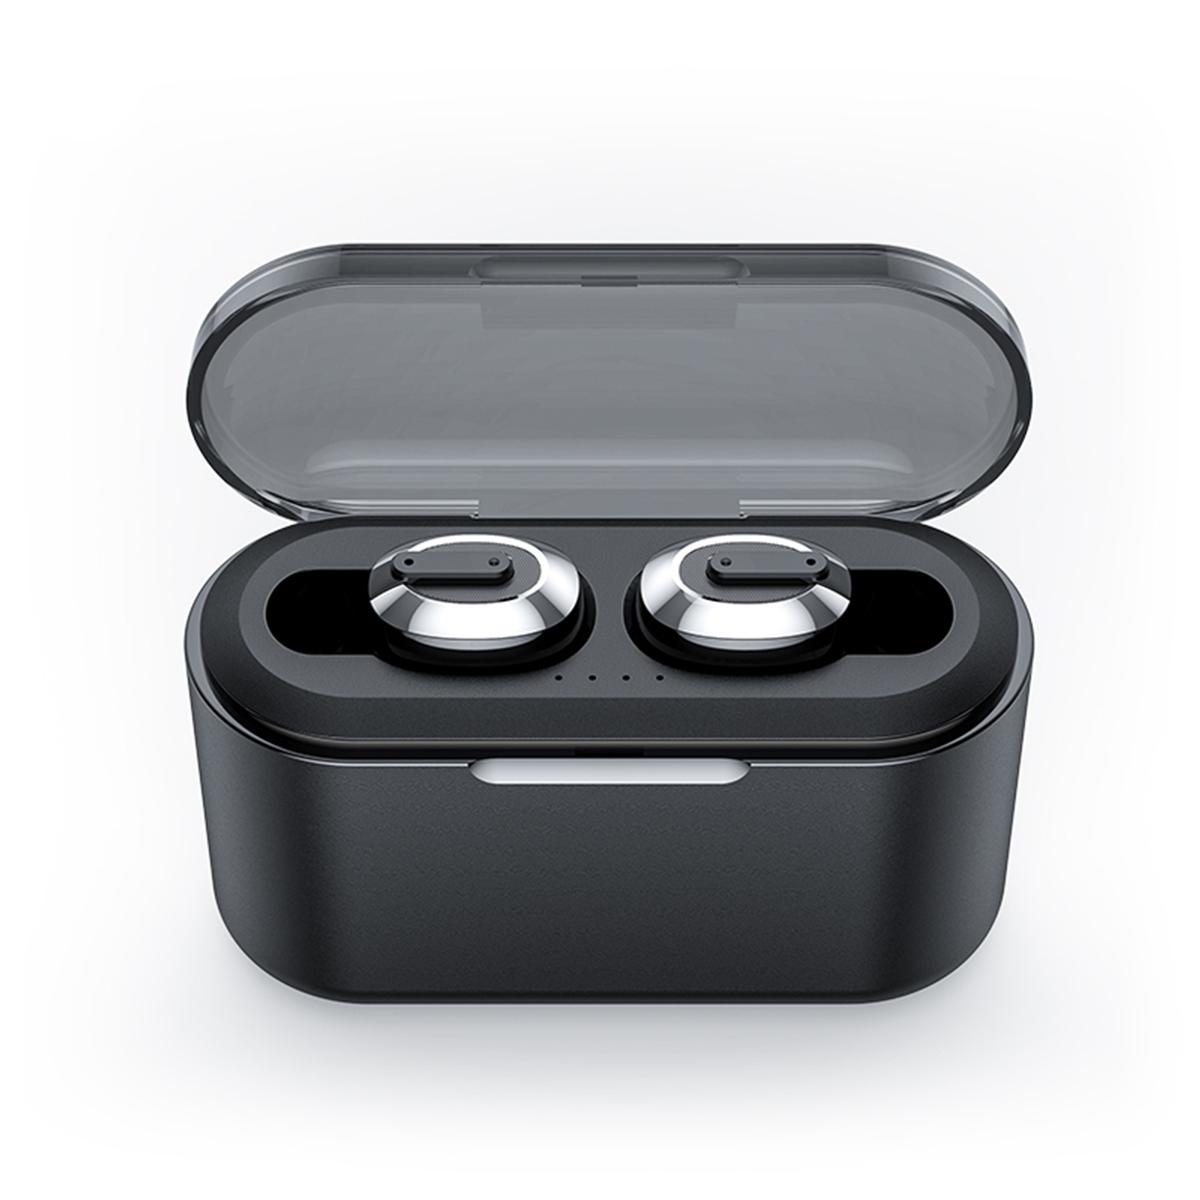 Шумоподавление] TWS Bluetooth 5.0 Mini Wireless Наушник IPX7 Водонепроницаемы Наушники с зарядкой 3000 мАч Коробка Power Bank